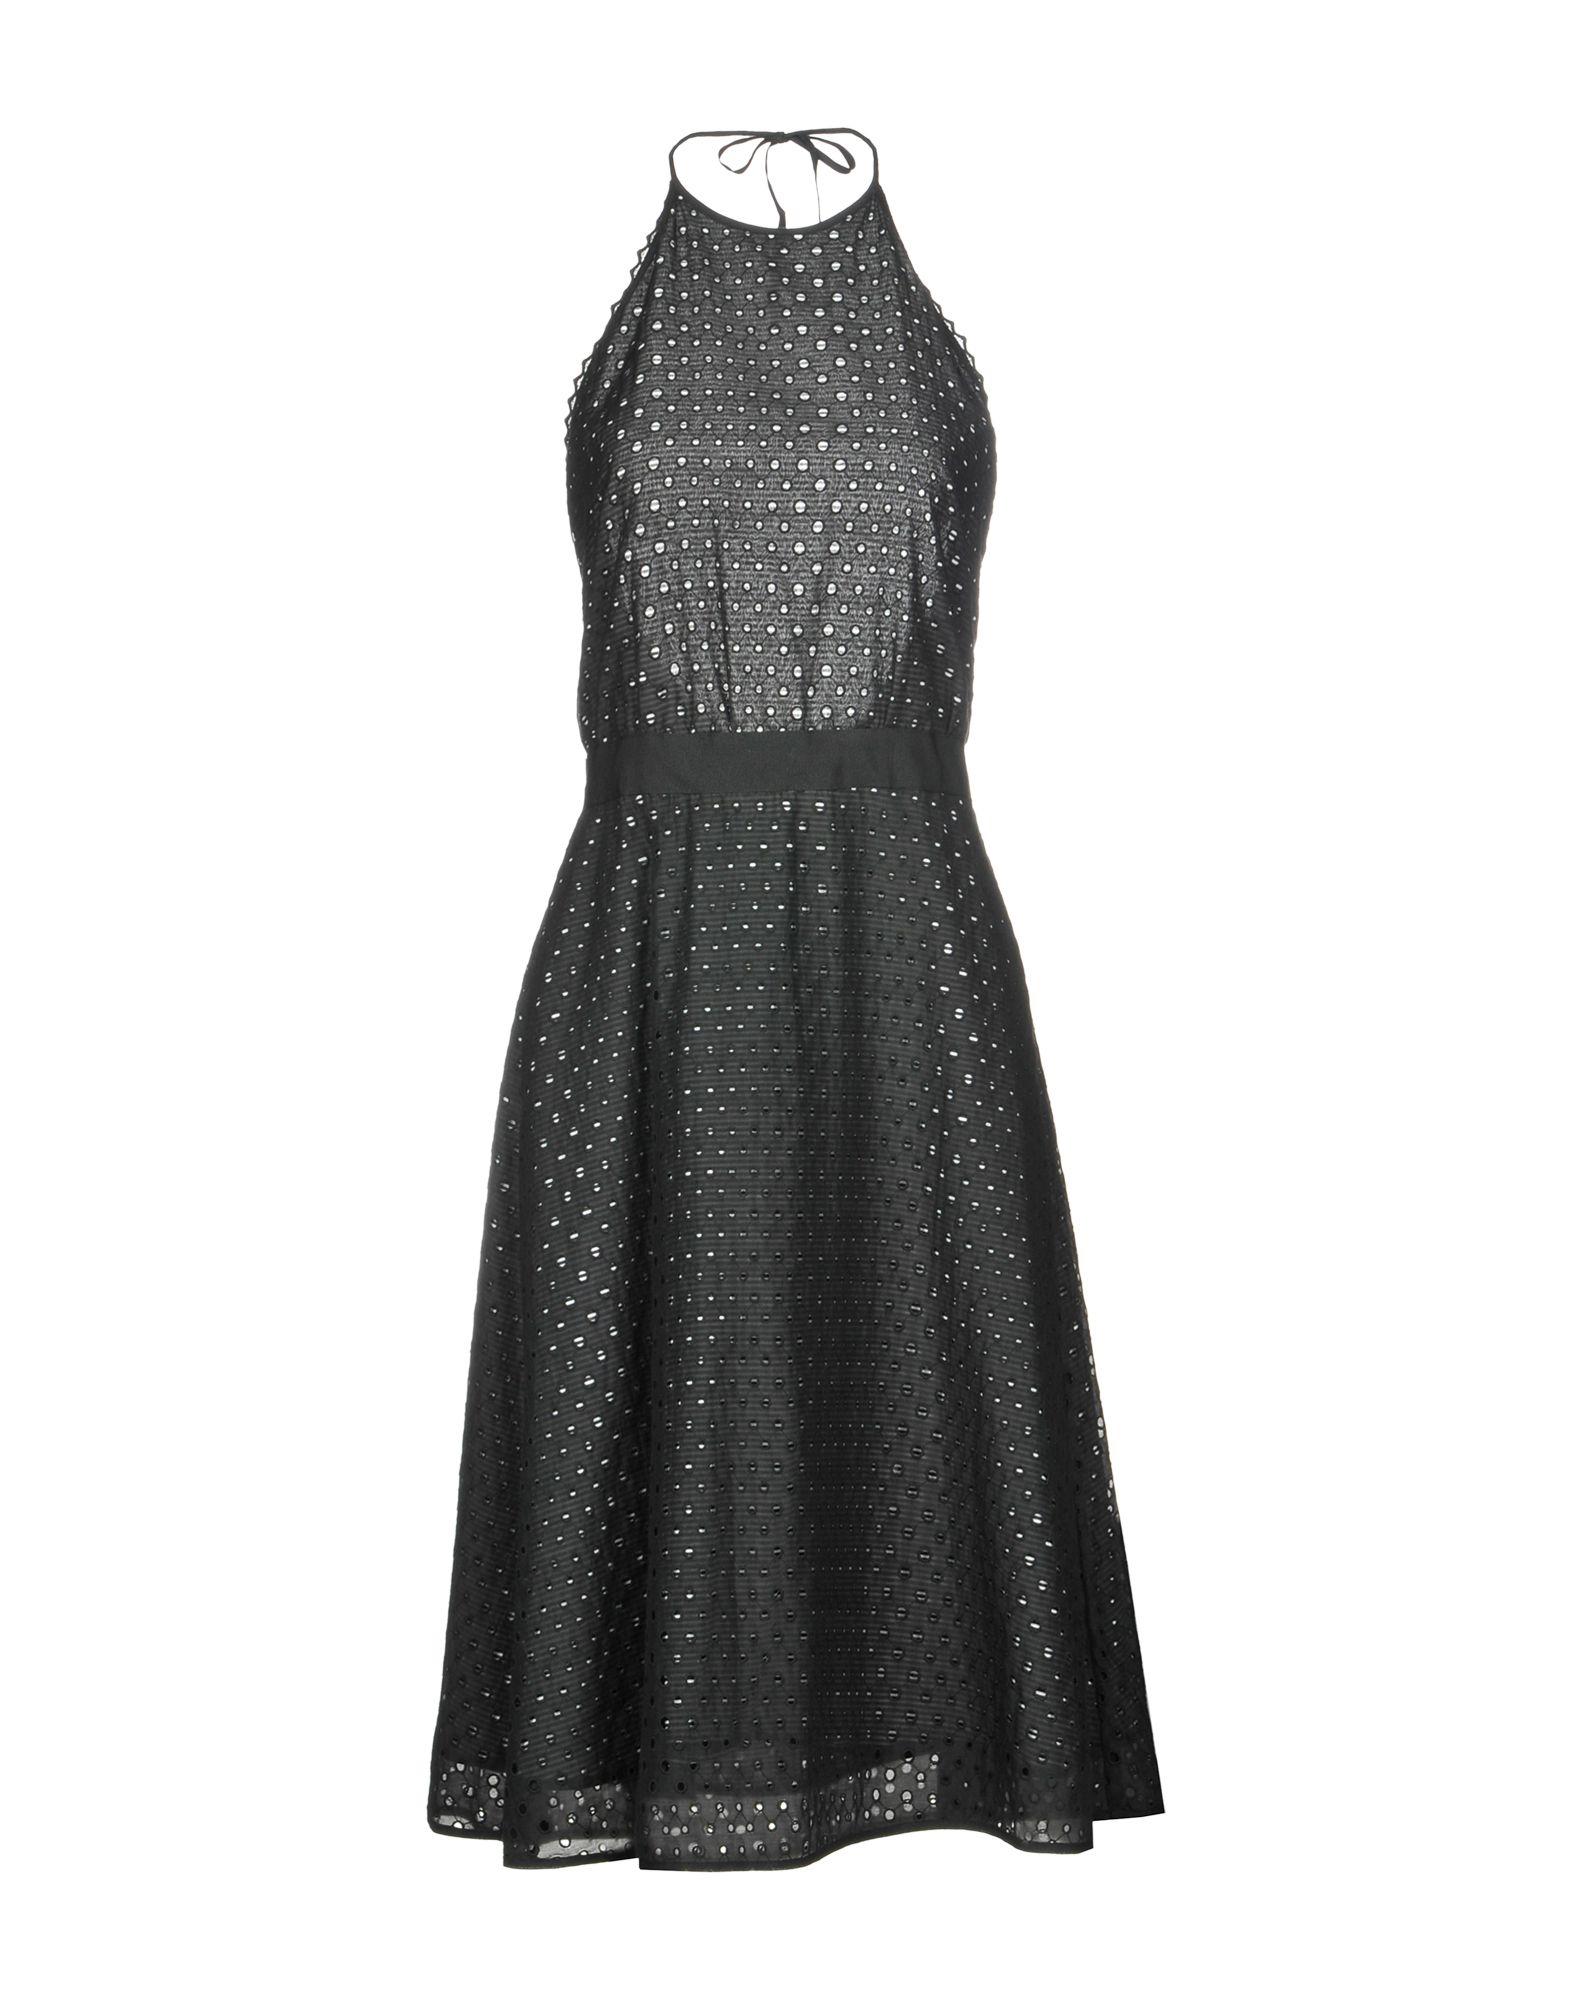 SPACE STYLE CONCEPT Платье длиной 3/4